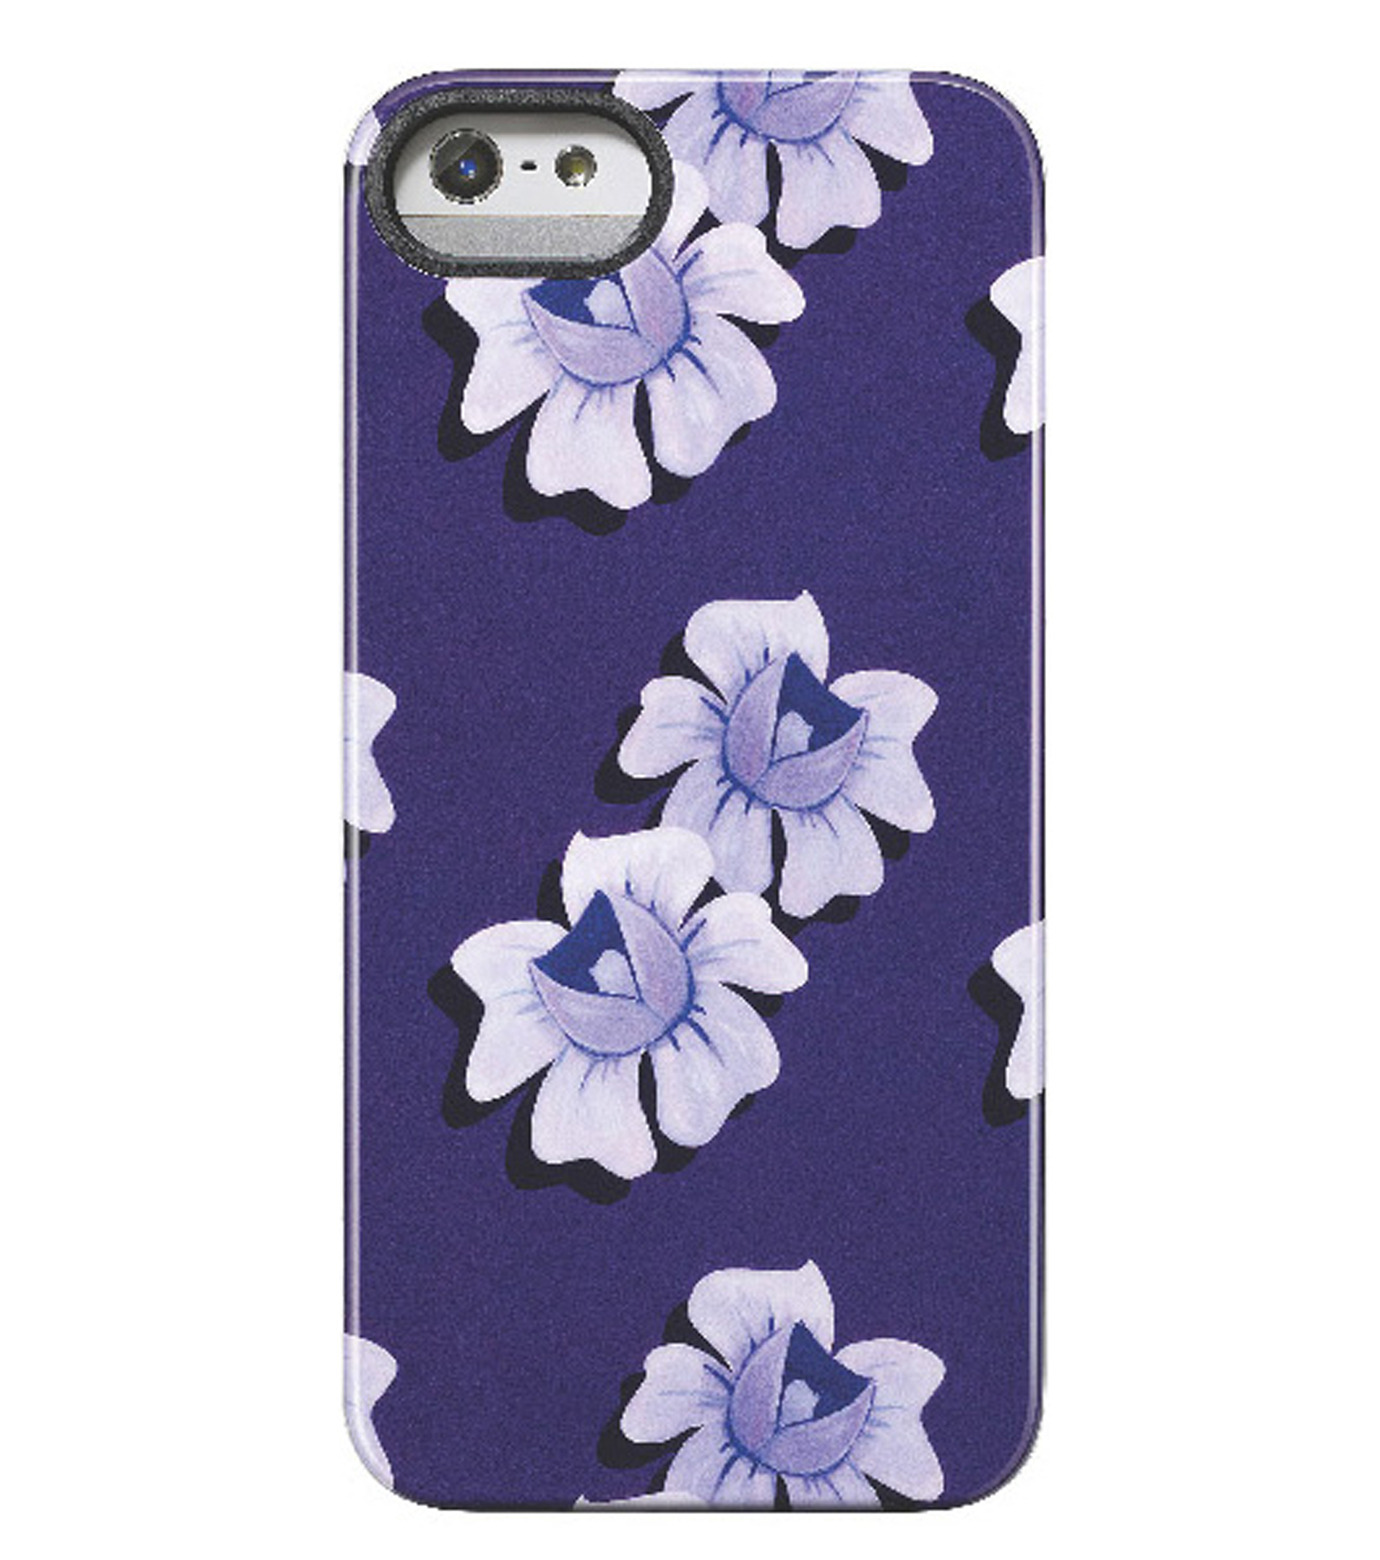 CASE SCENARIO(ケースシナリオ)のHouse of holland-BLUE(ケースiphone5/5s/se/case iphone5/5s/se)-HH-IPH5-FL-92 拡大詳細画像1